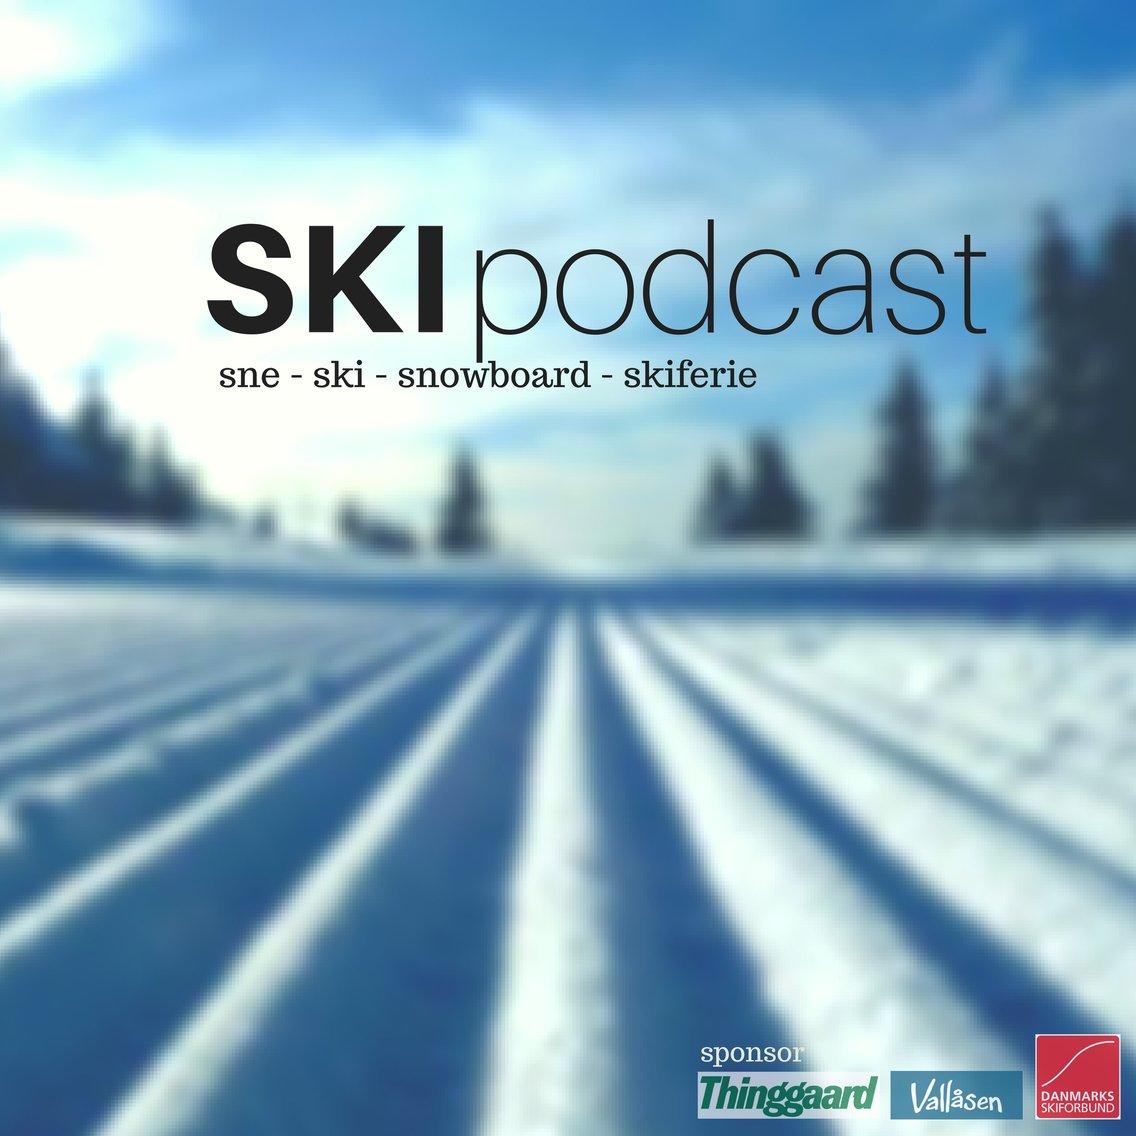 SKIpodcast - imagen de portada